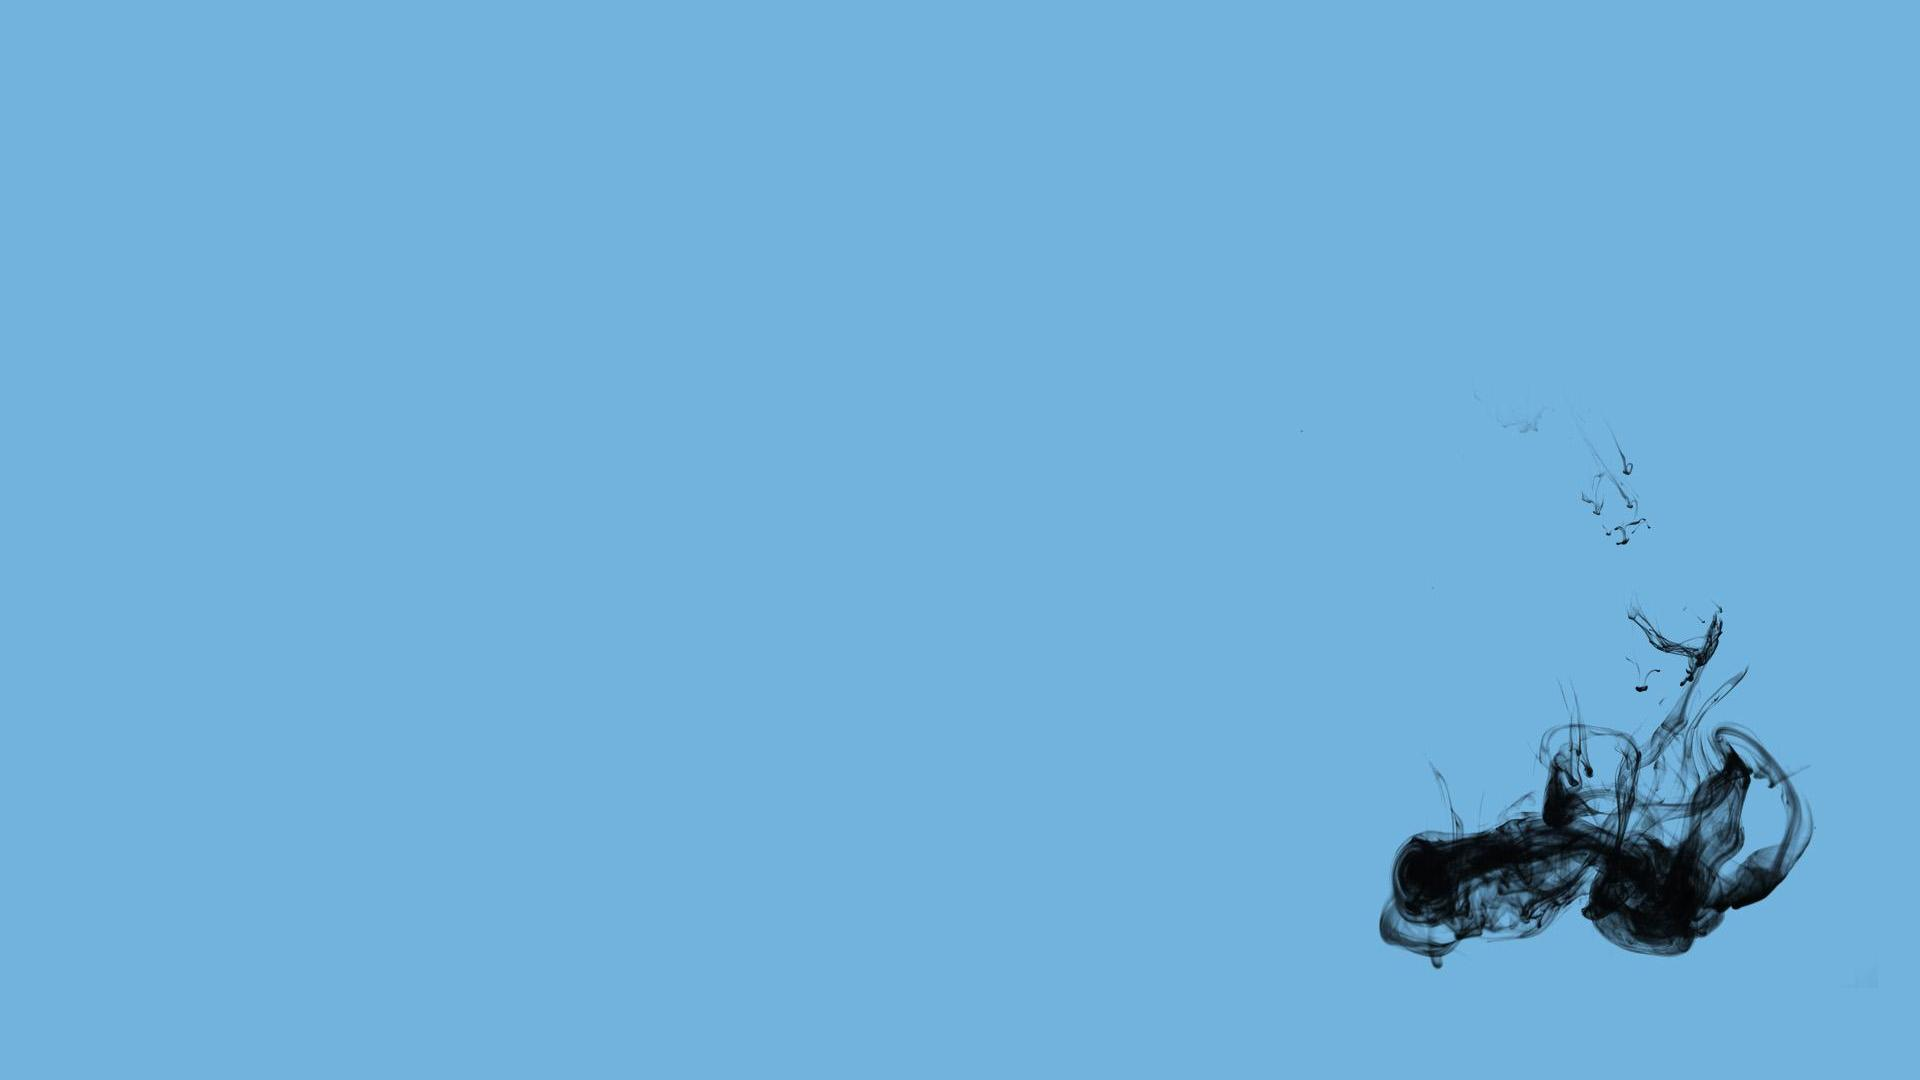 1920x1080 Baby Blue Black Wallpaper Blue Wallpapers 1920x1080